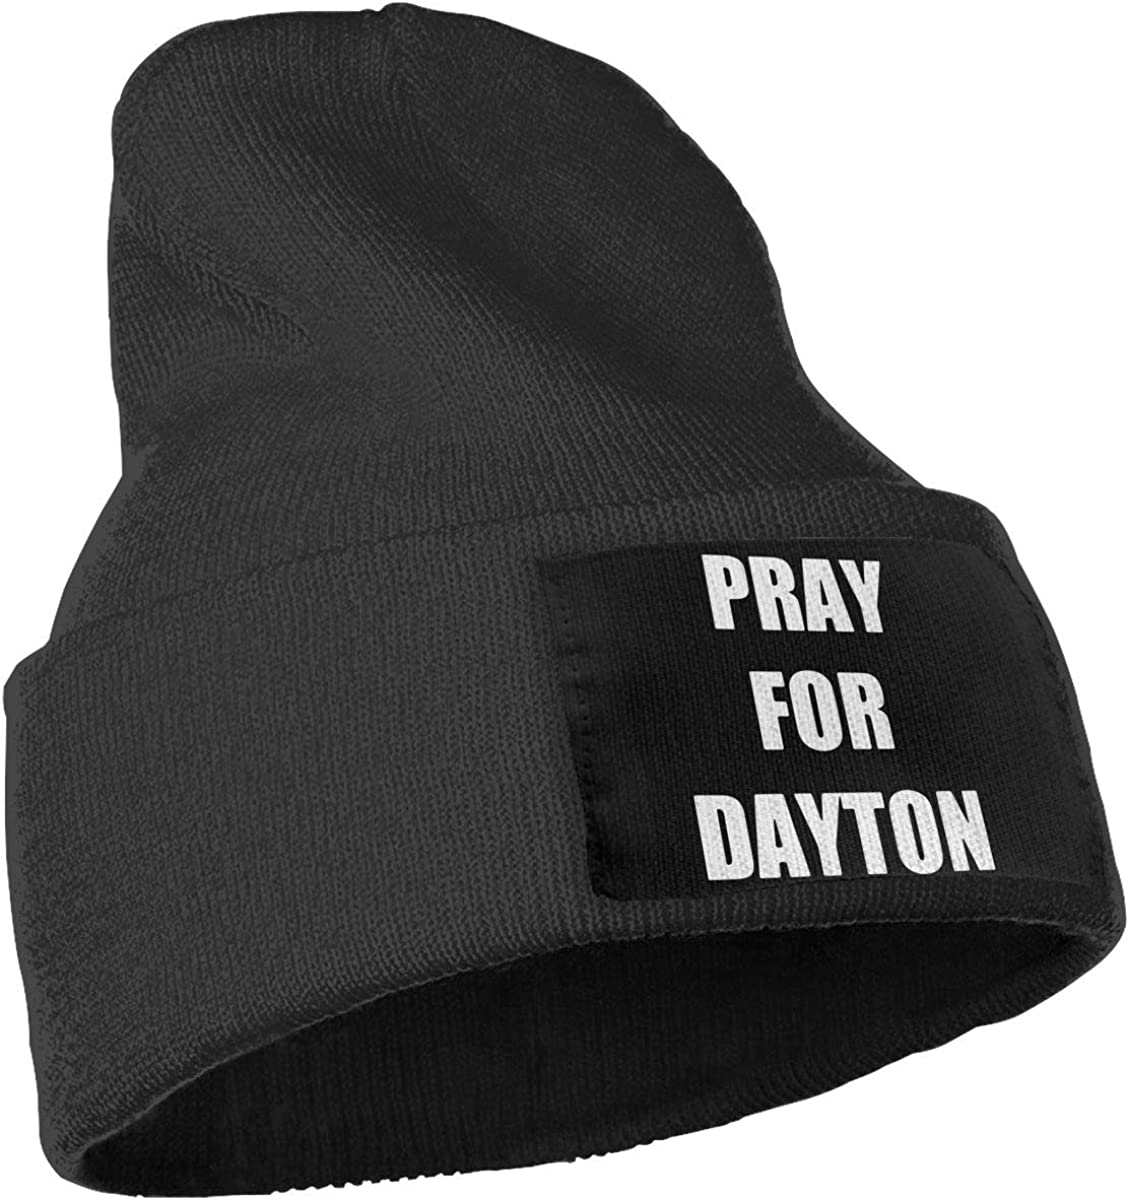 COLLJL-8 Men /& Women Pray for Dayton Outdoor Stretch Knit Beanies Hat Soft Winter Knit Caps